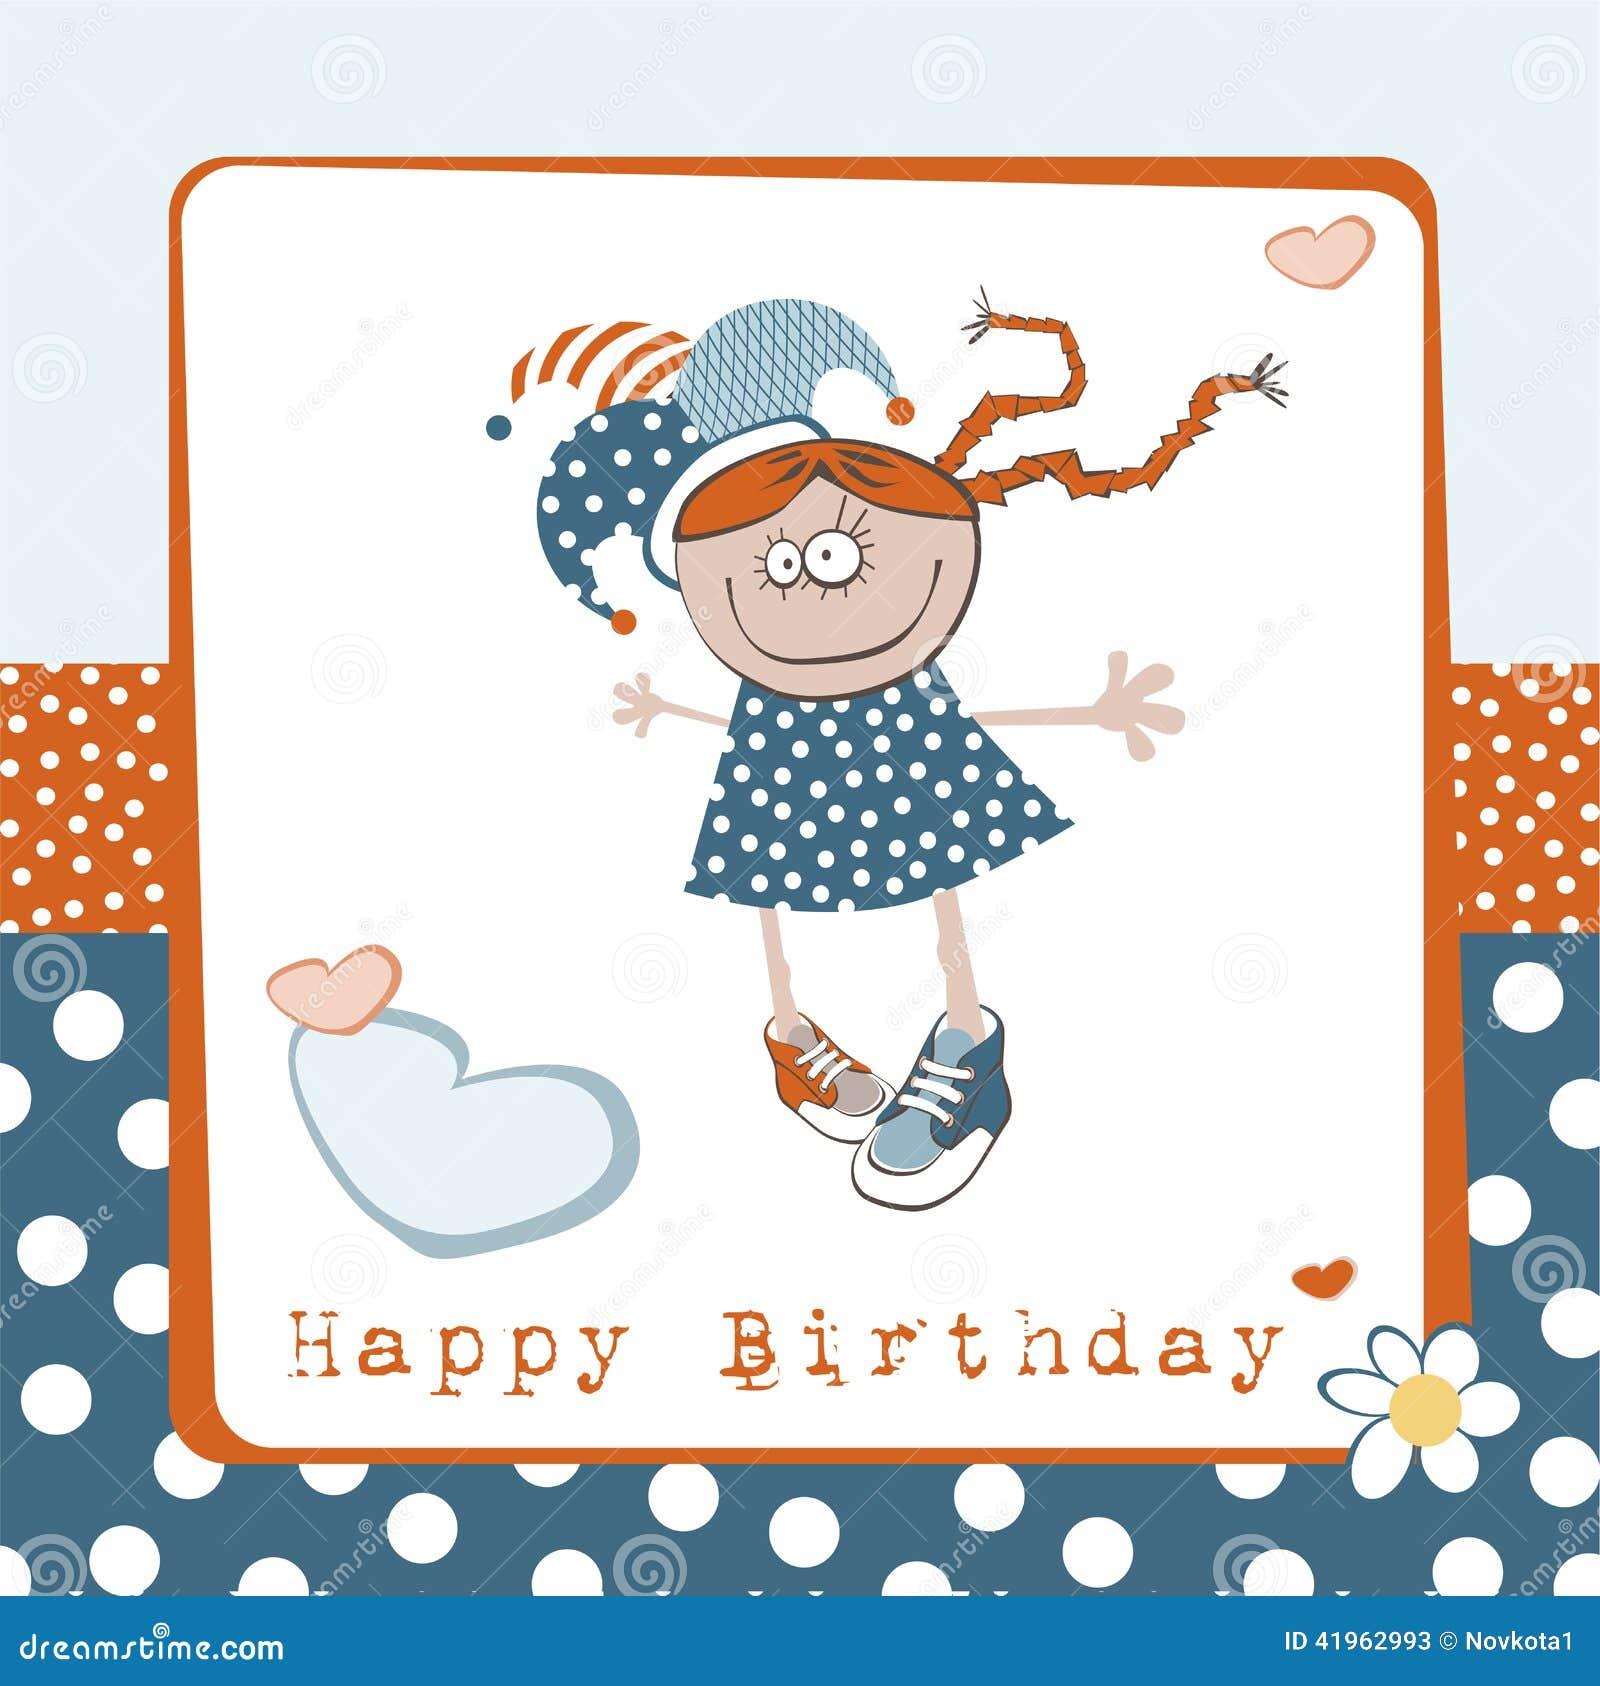 Happy Birthday Girl Illustration ~ Happy birthday girl stock illustration image